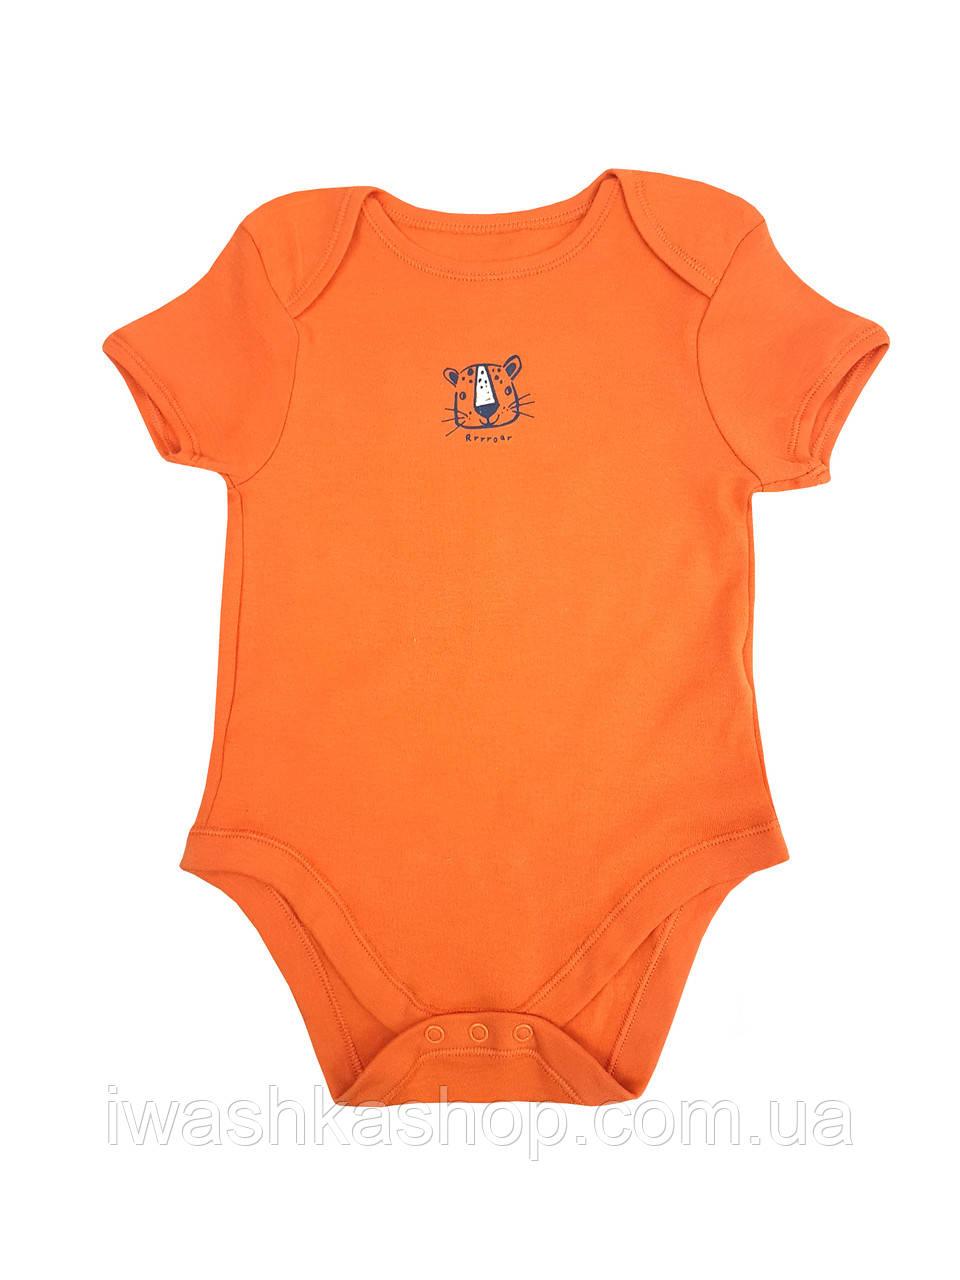 Боди с короткими рукавами с тигром для мальчика 1,5 - 2 года, размер 92, Primark baby.